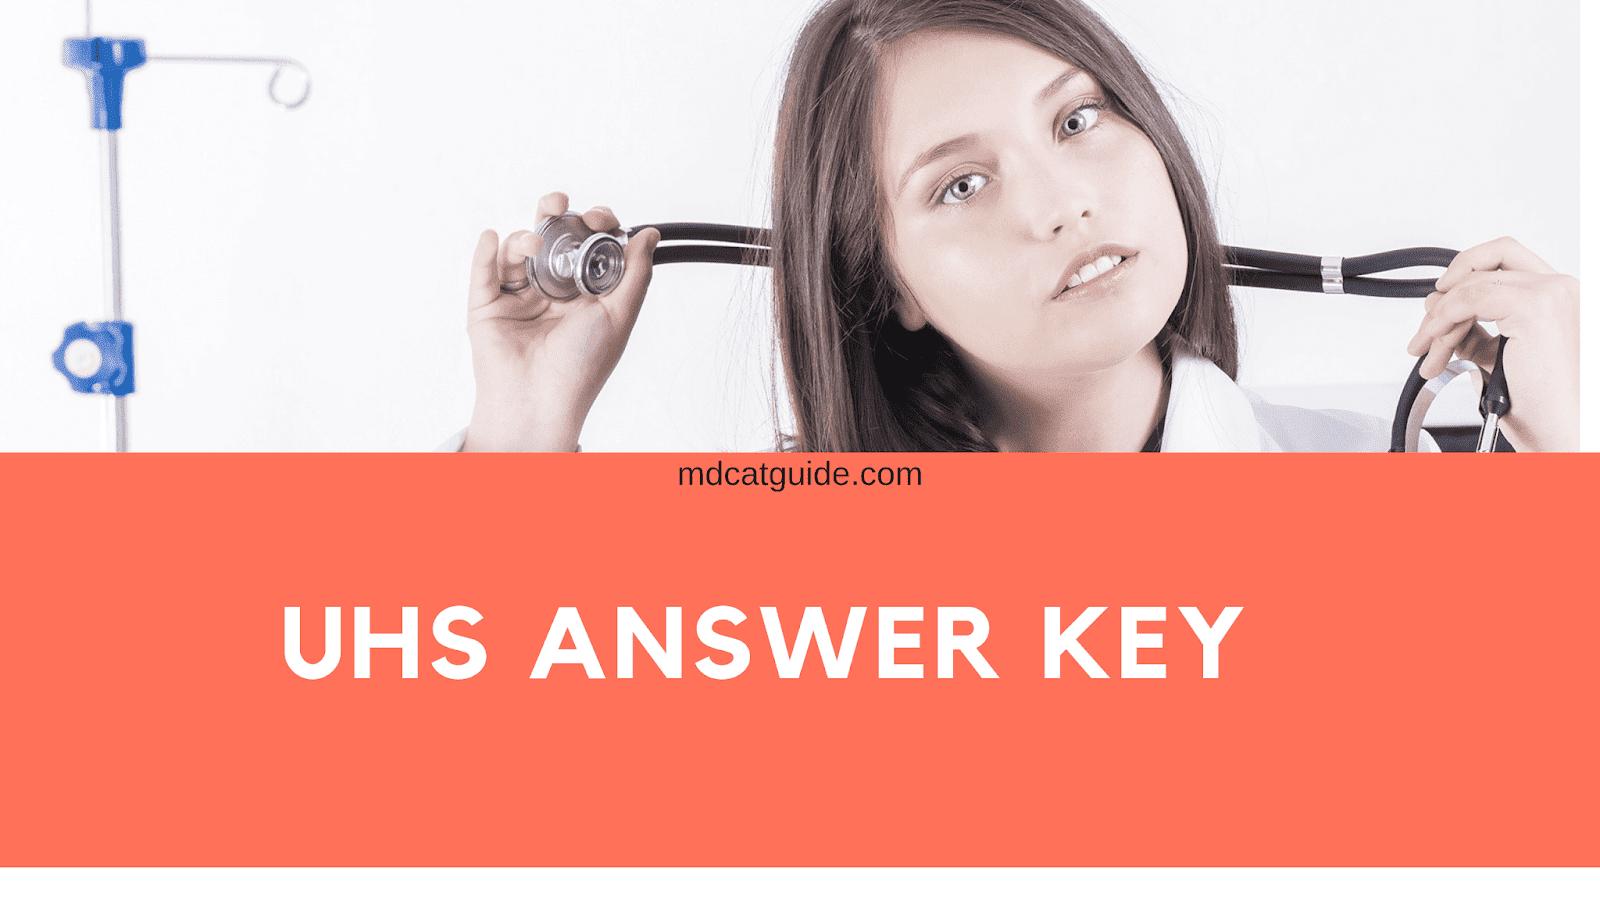 uhs answer key 2019